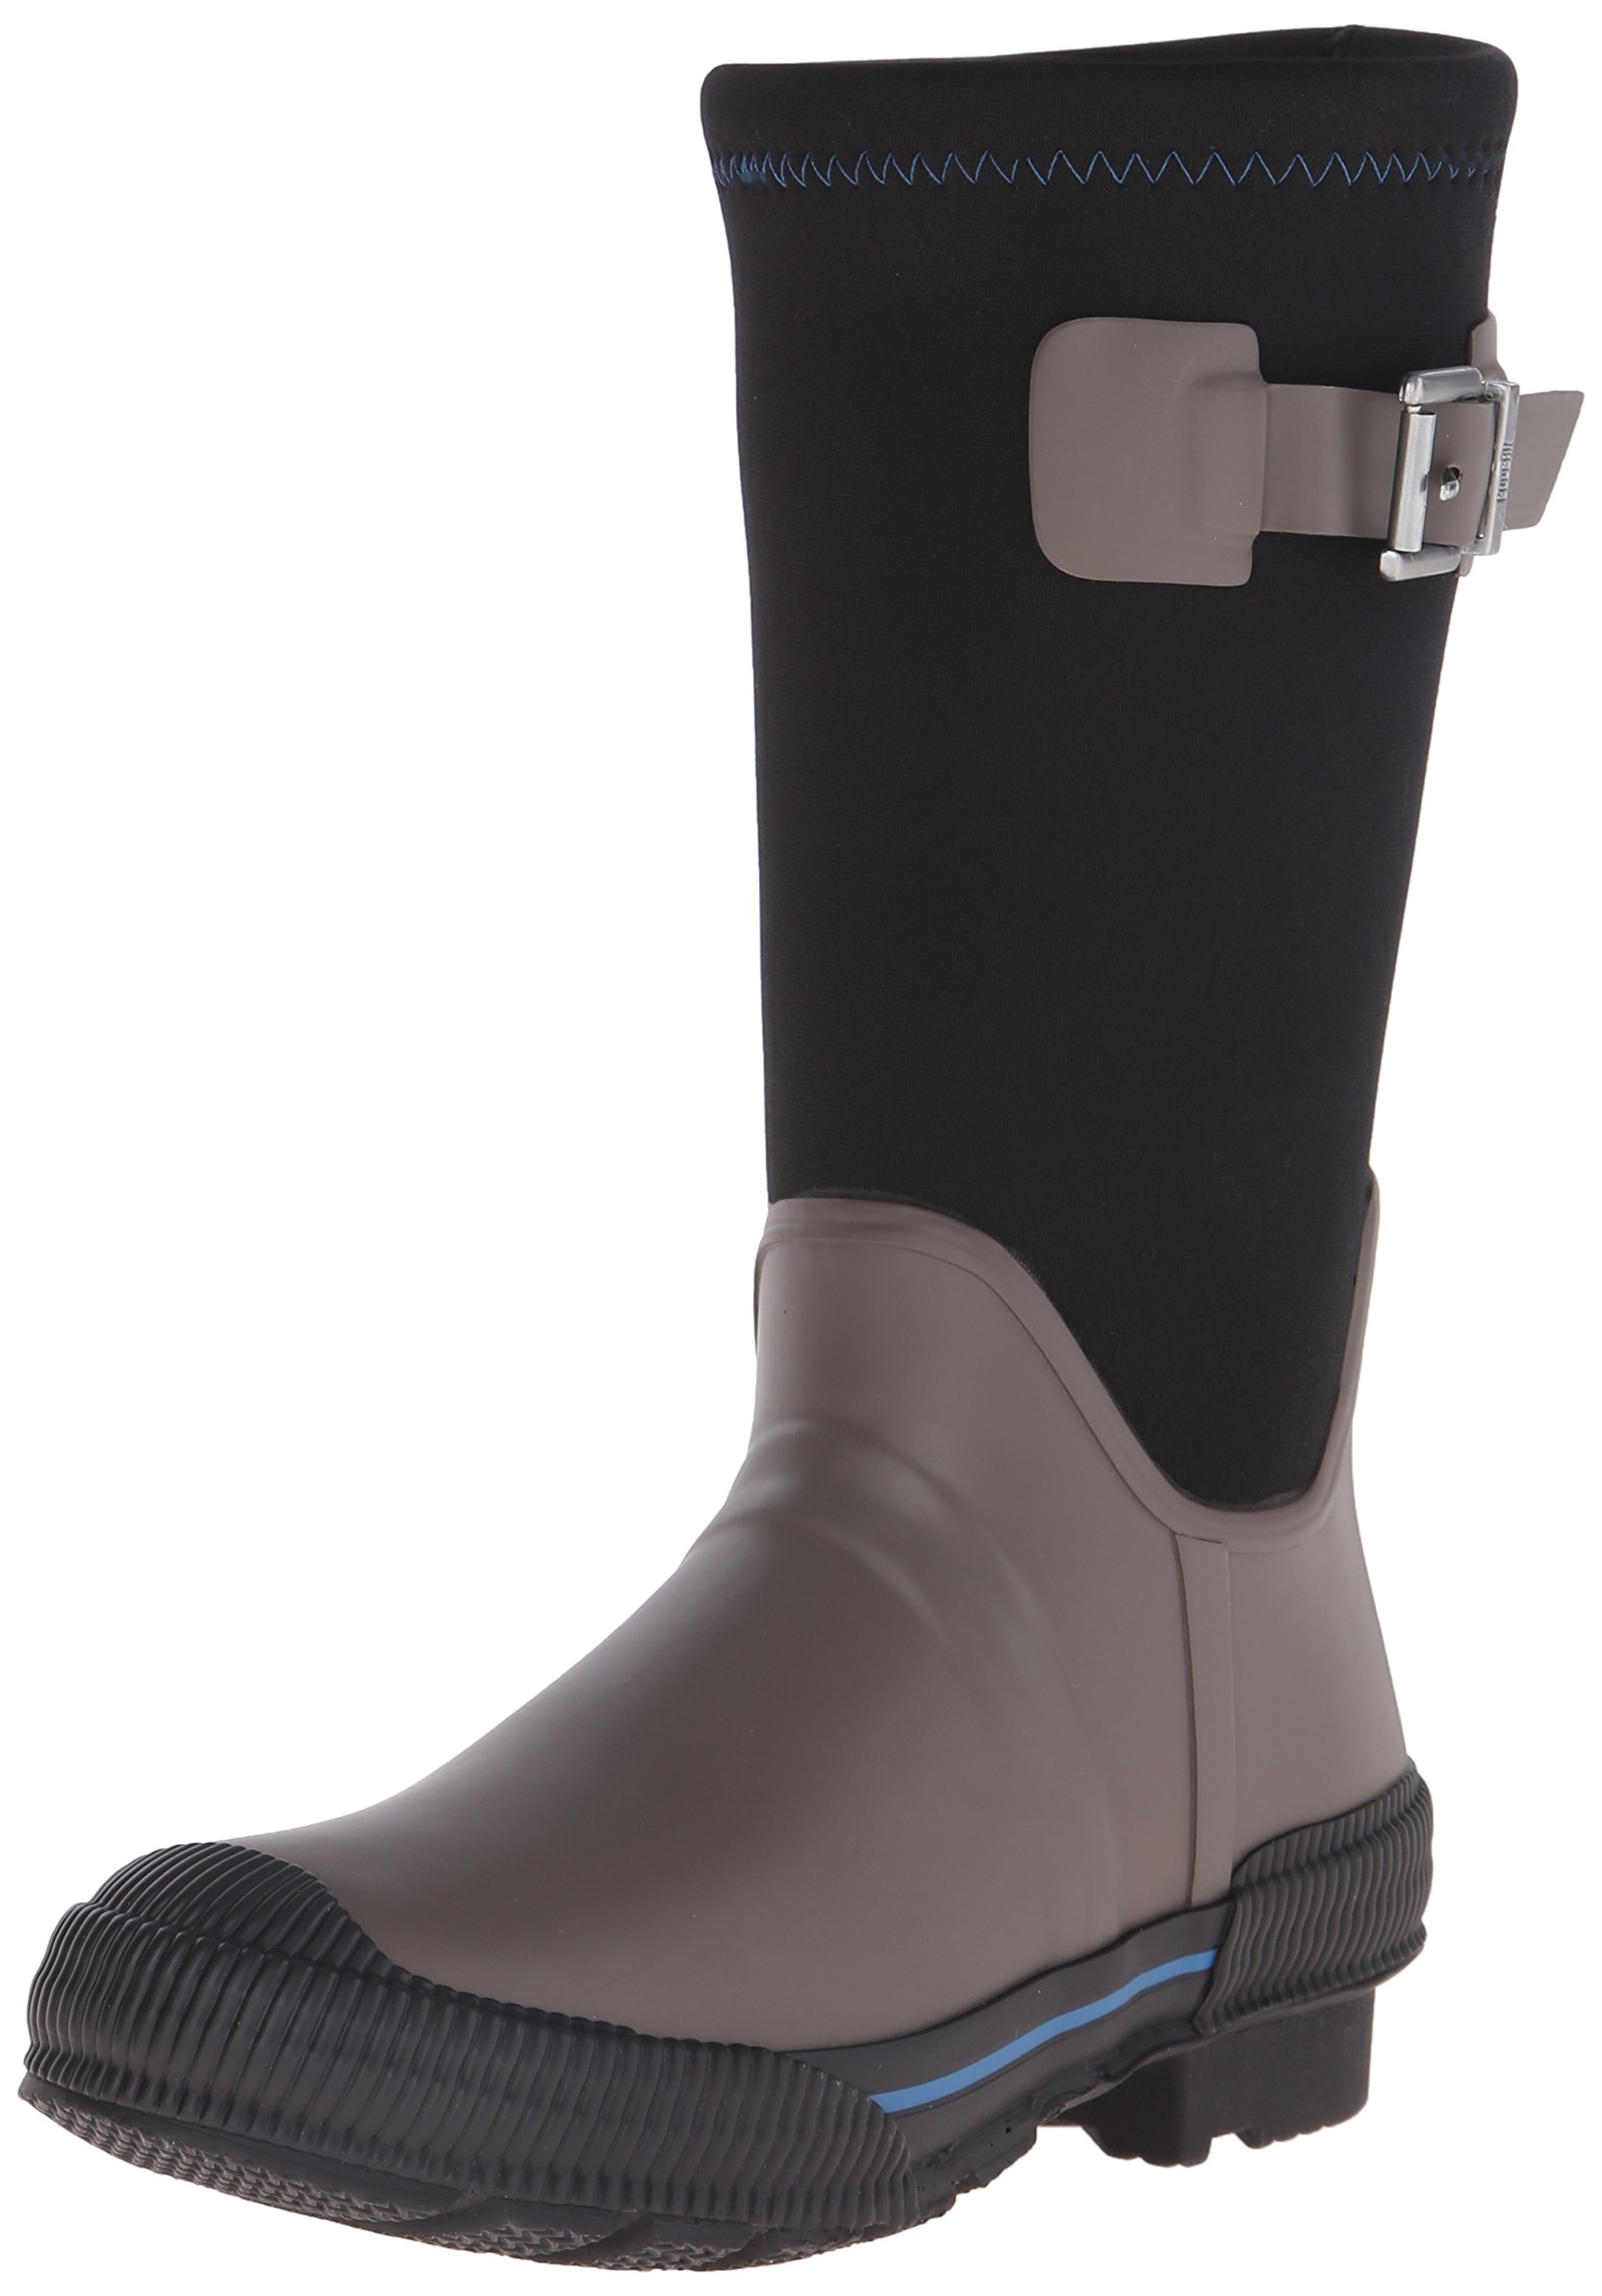 Cougar Women's Hardy Rain Boot, Grey, 11 M US